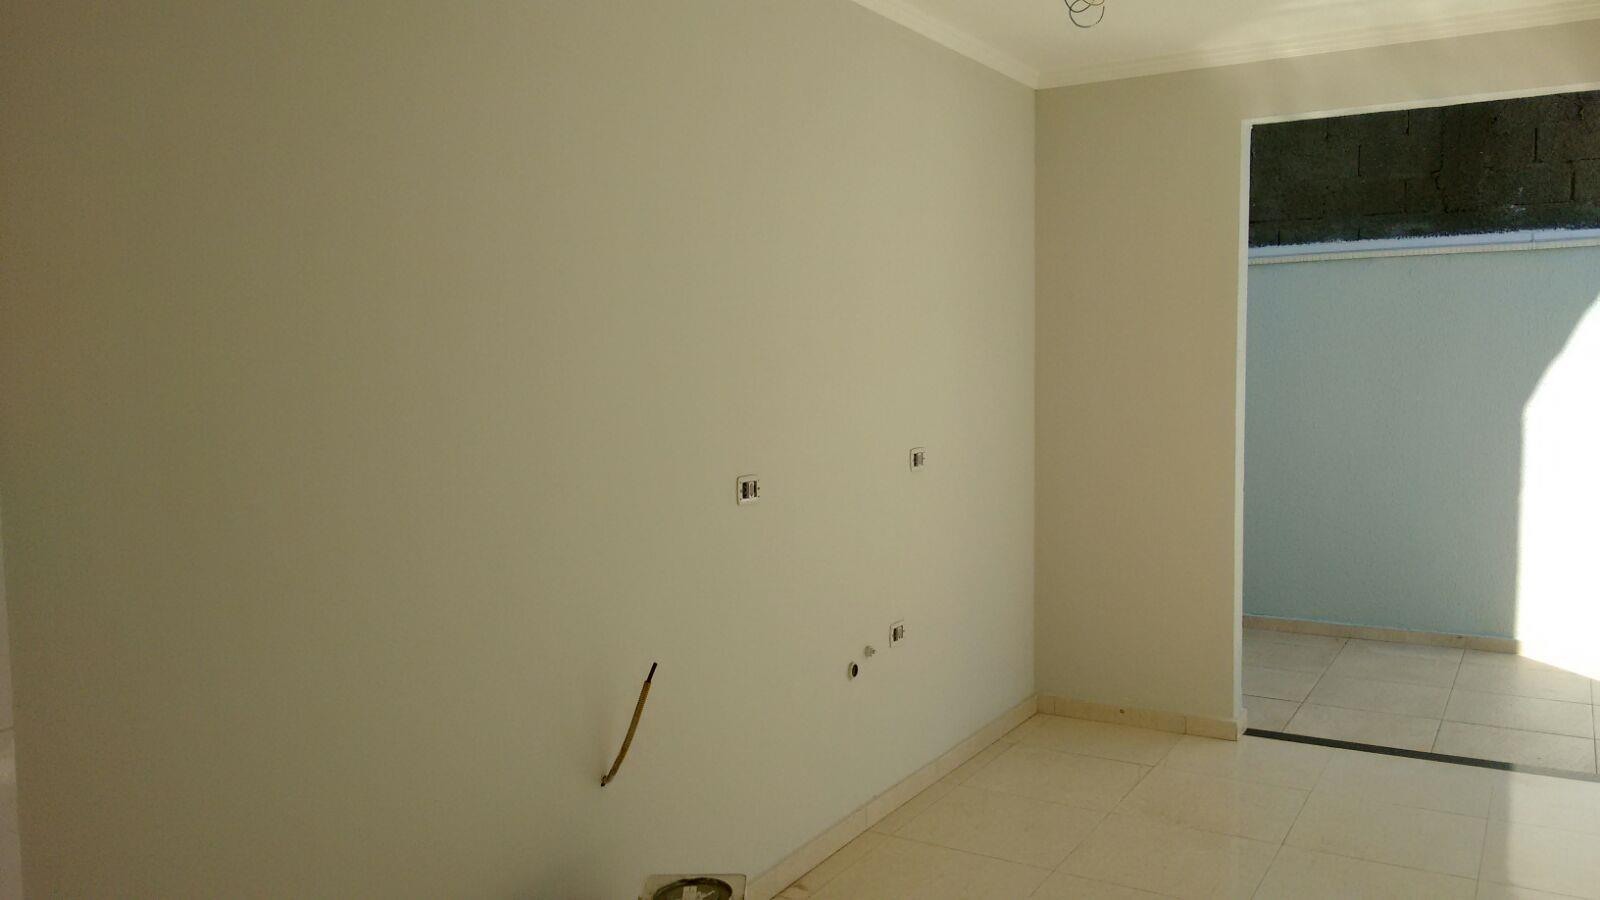 Soute Imóveis - Casa 3 Dorm, Jardim Santa Clara - Foto 5